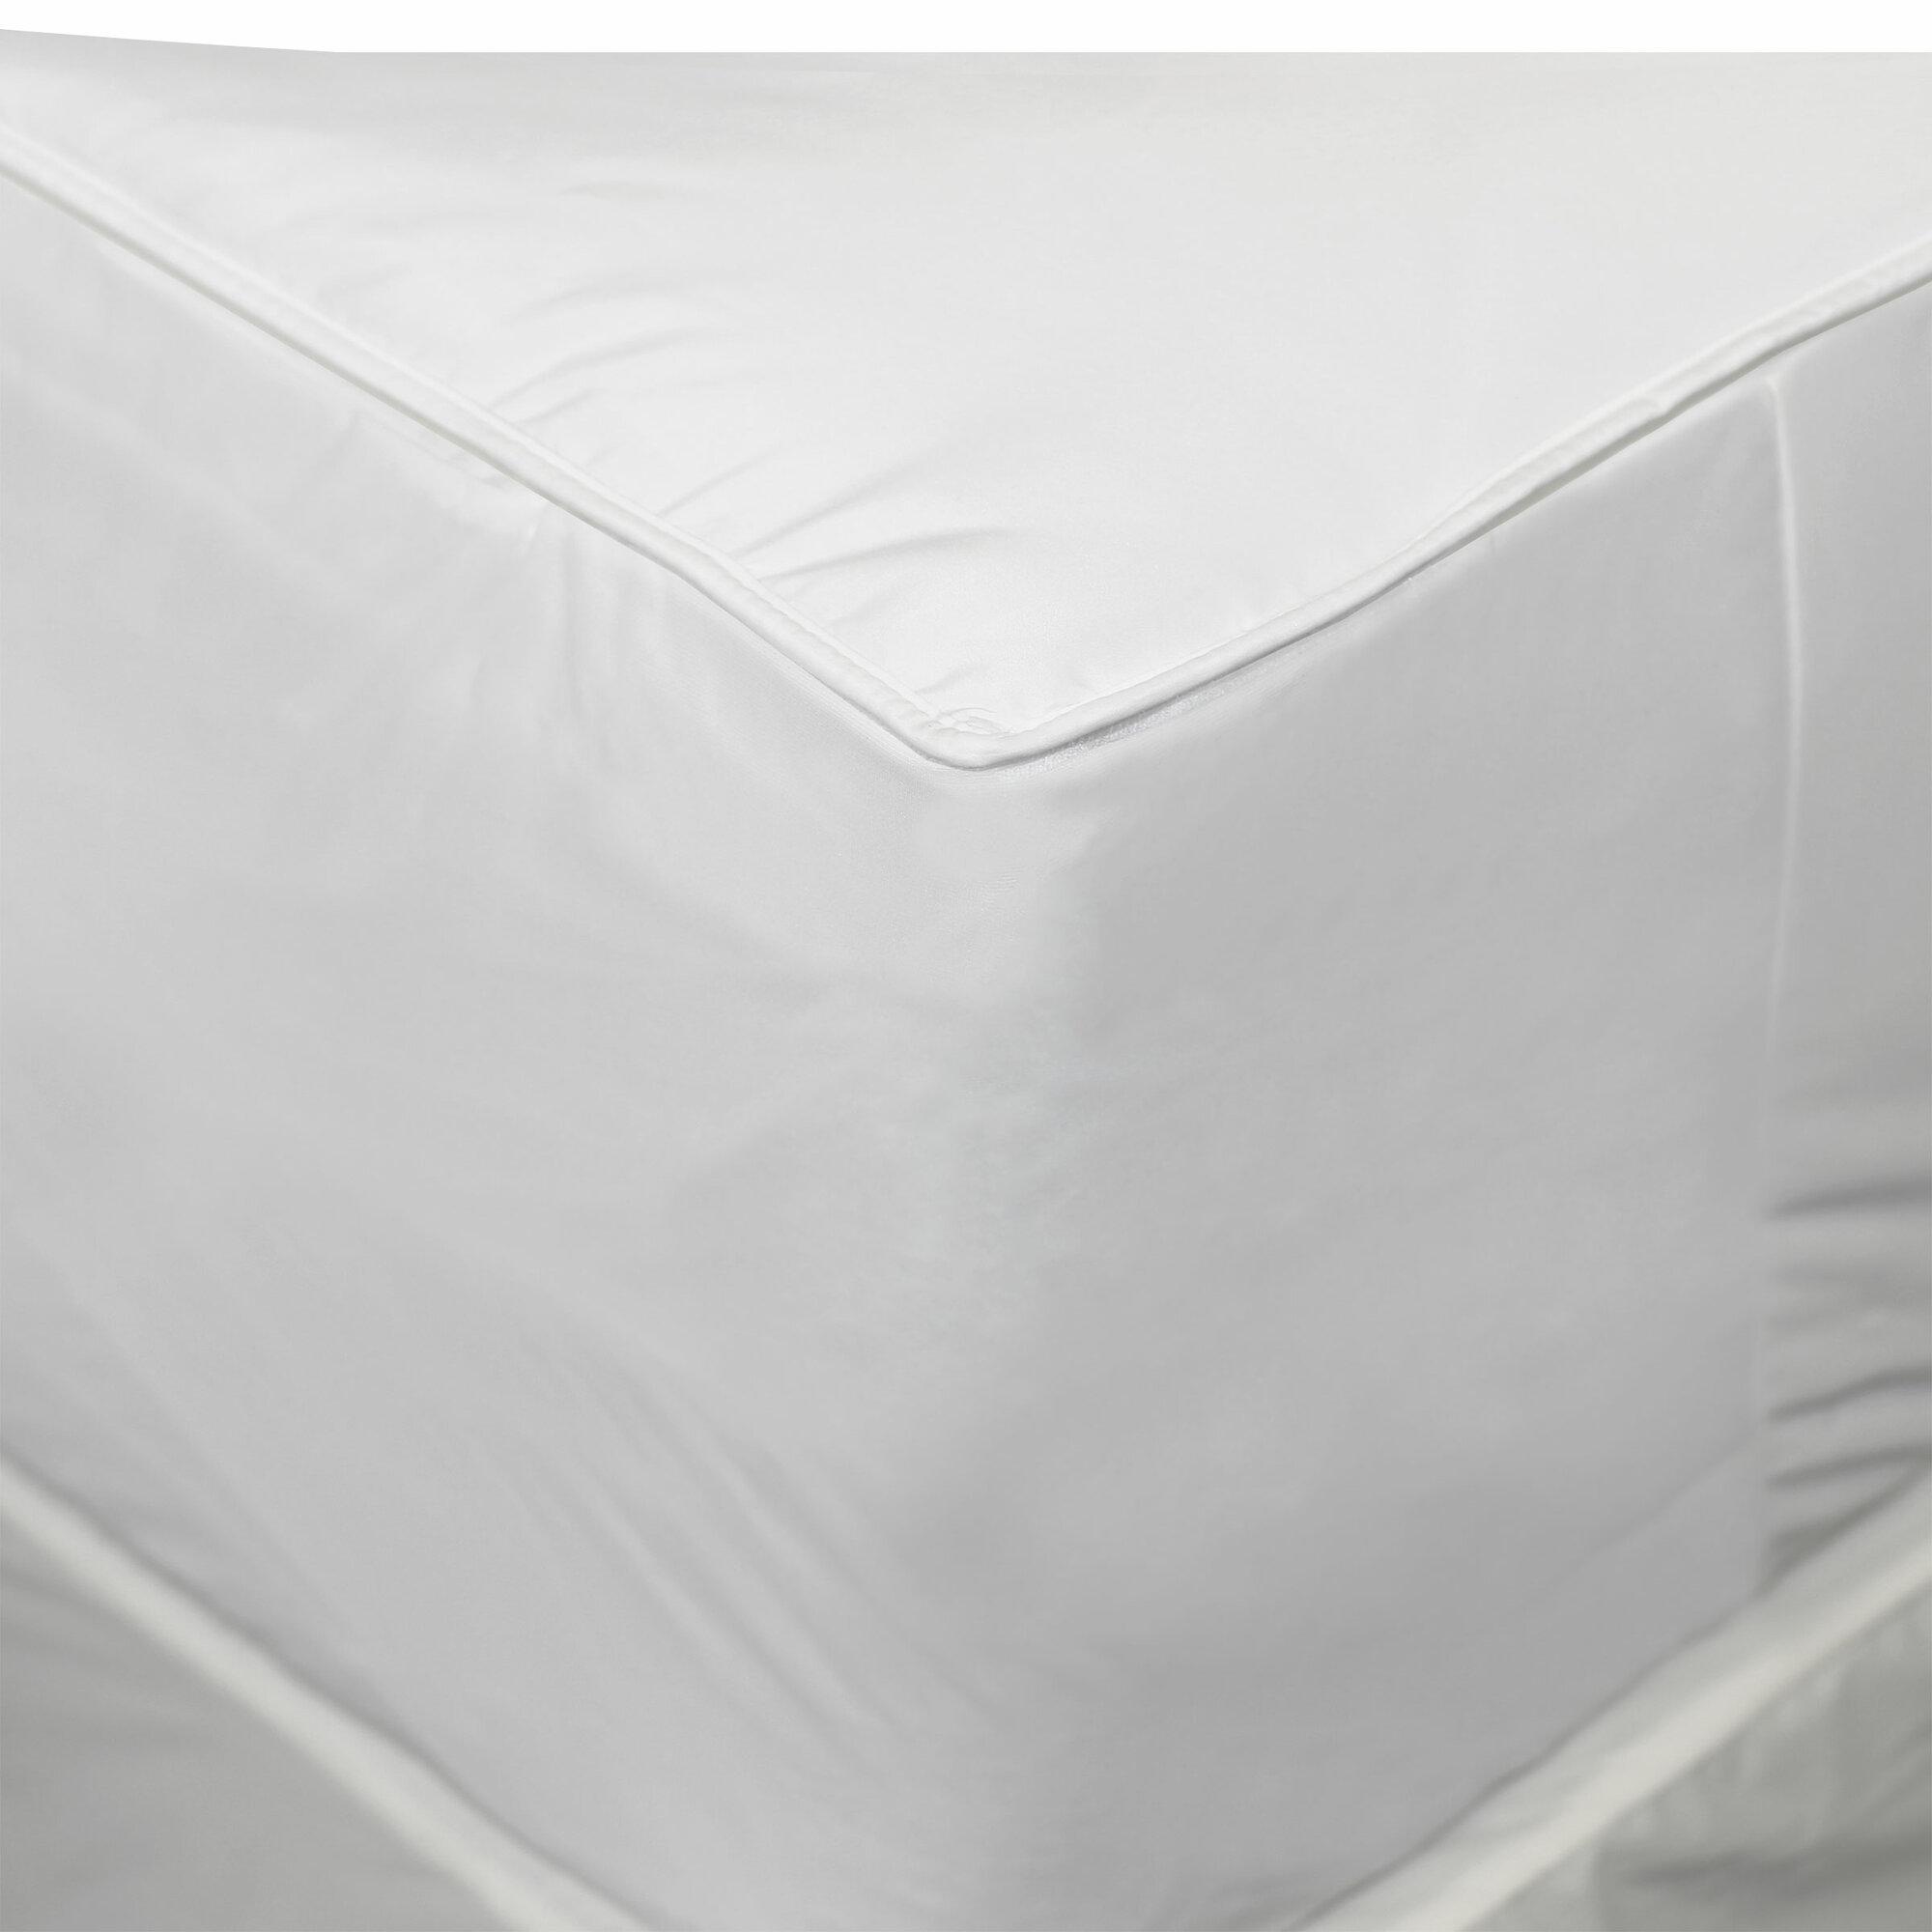 Allerease Polyester Mattress Pad Ebay